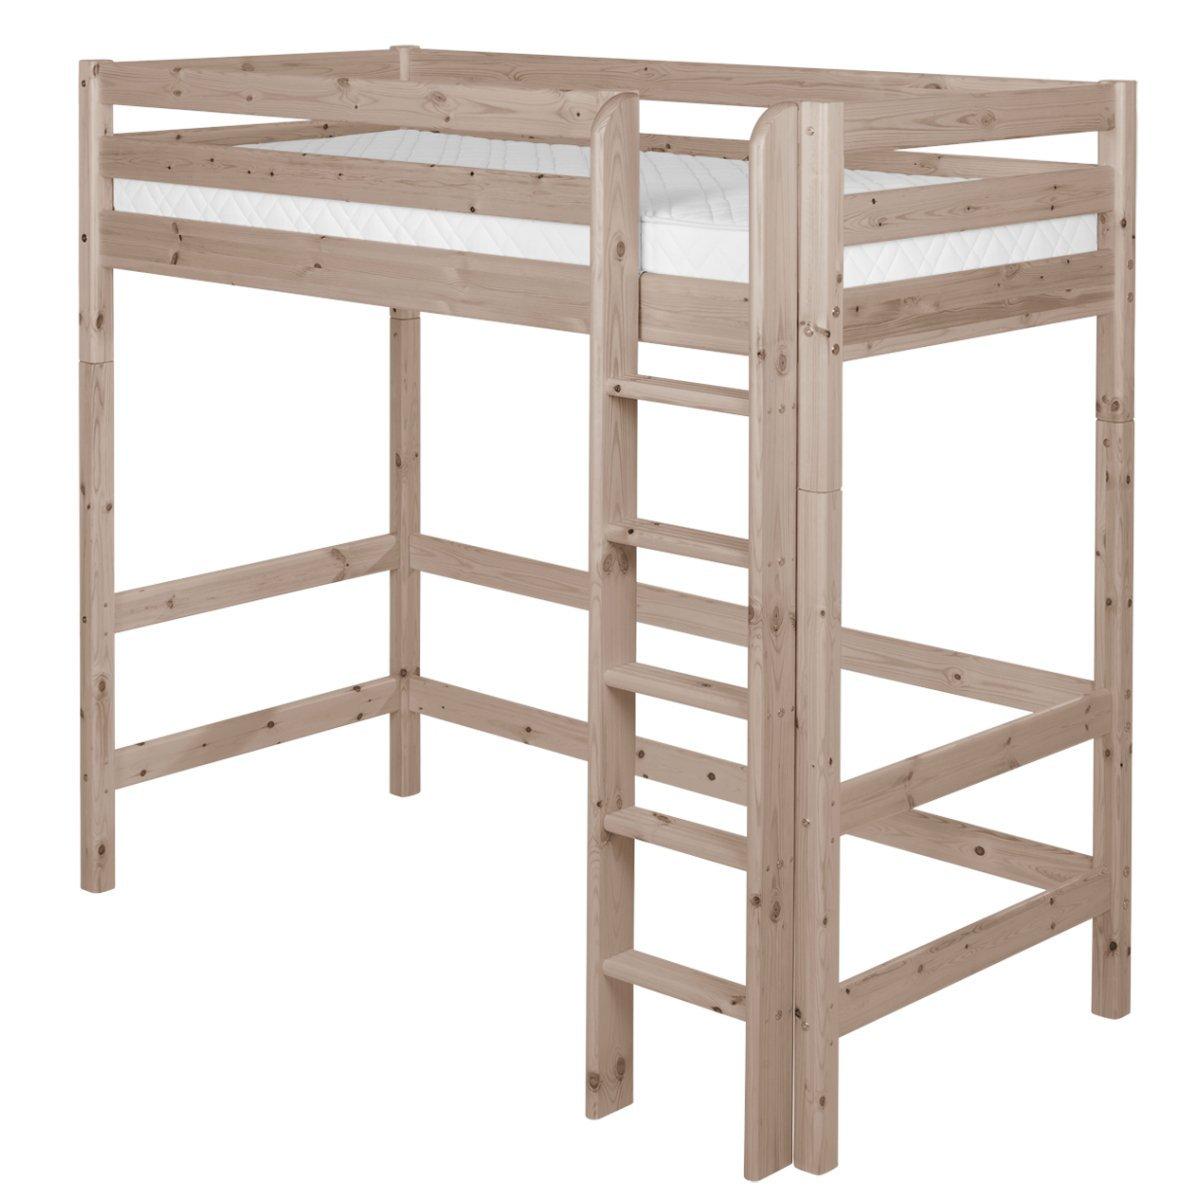 flexa classic hochbett in terra 90 10069 11 01 674. Black Bedroom Furniture Sets. Home Design Ideas